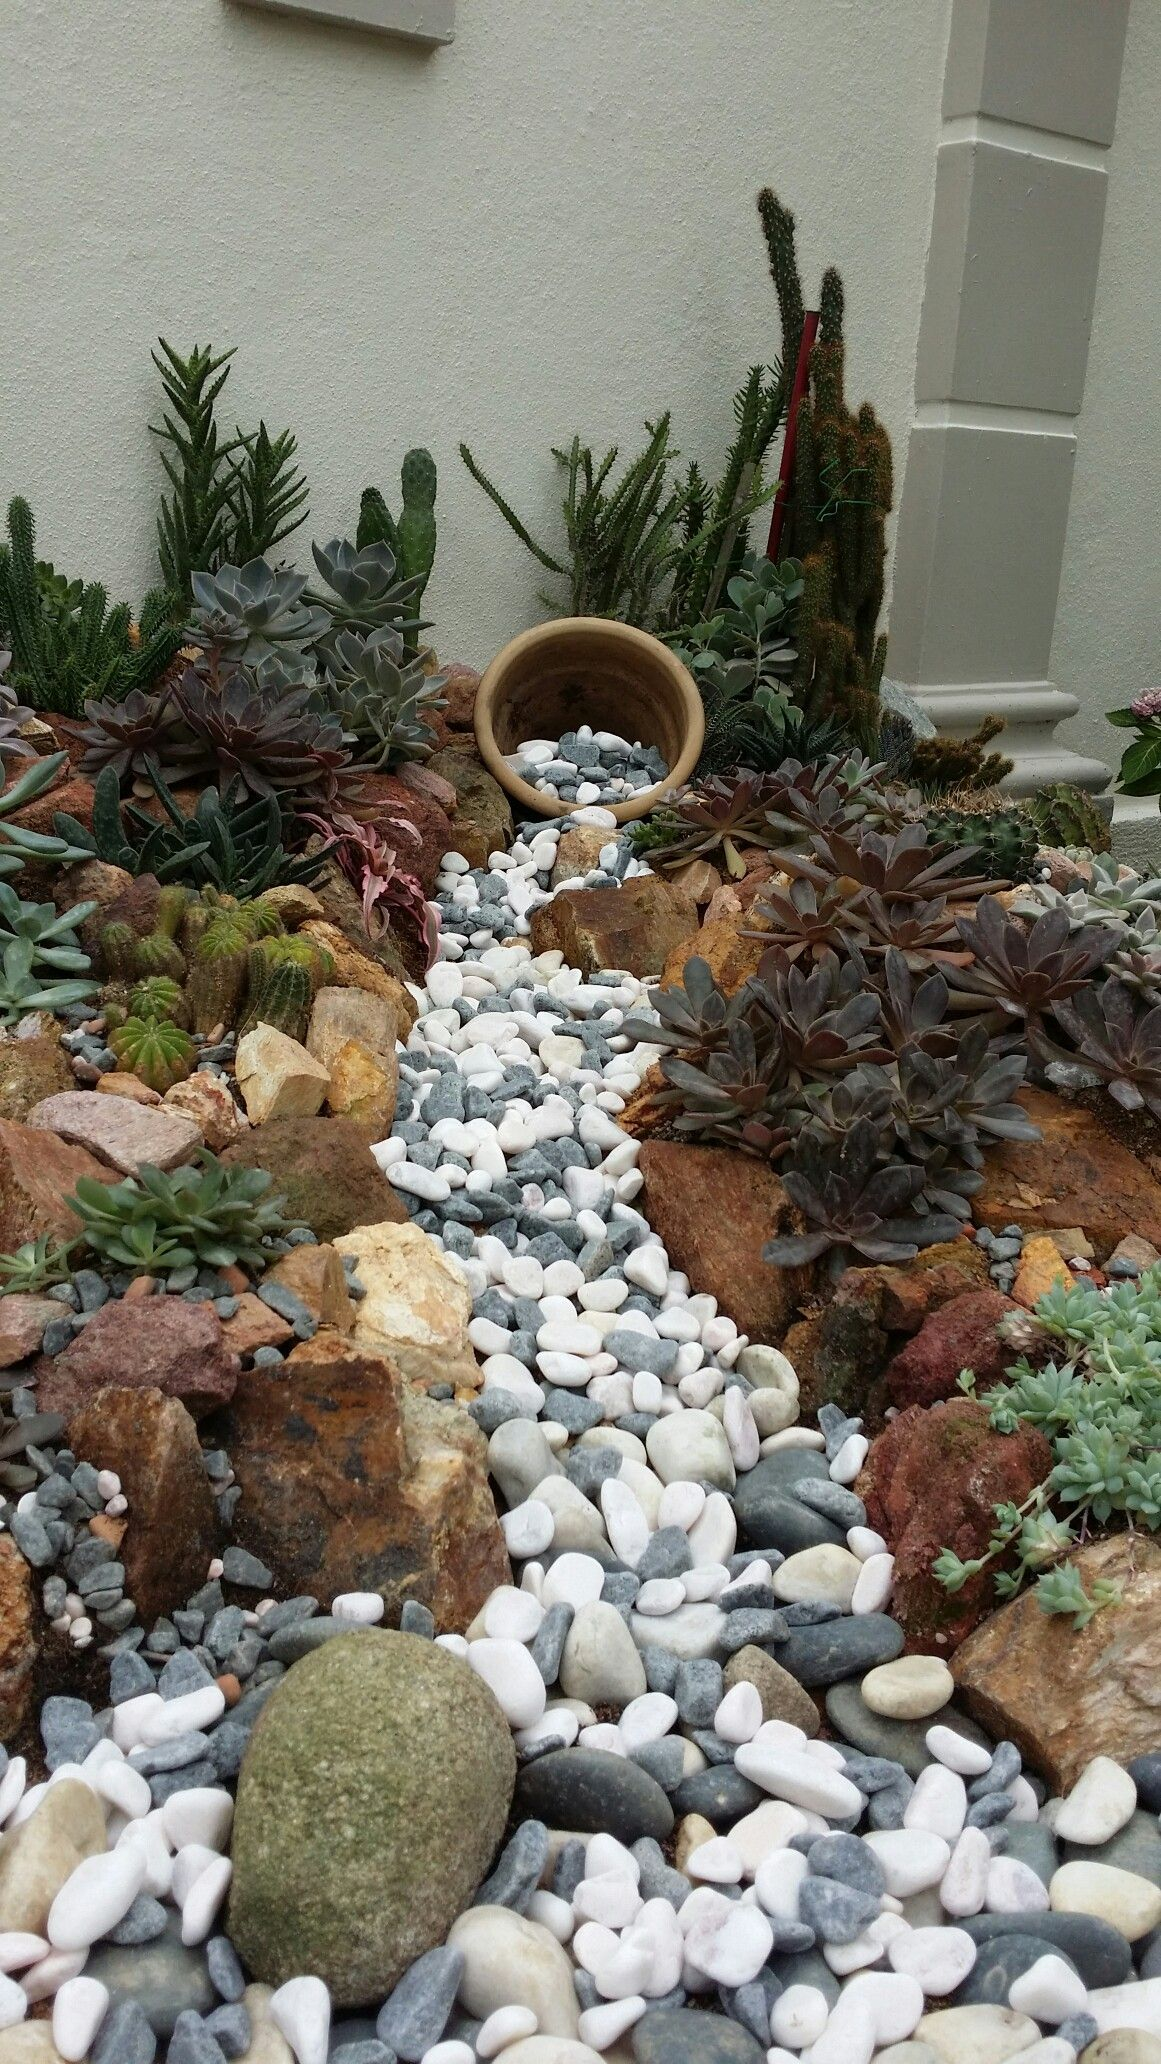 Pin By Maznis On Mine Rock Garden Design Landscaping With Rocks Rock Garden Landscaping